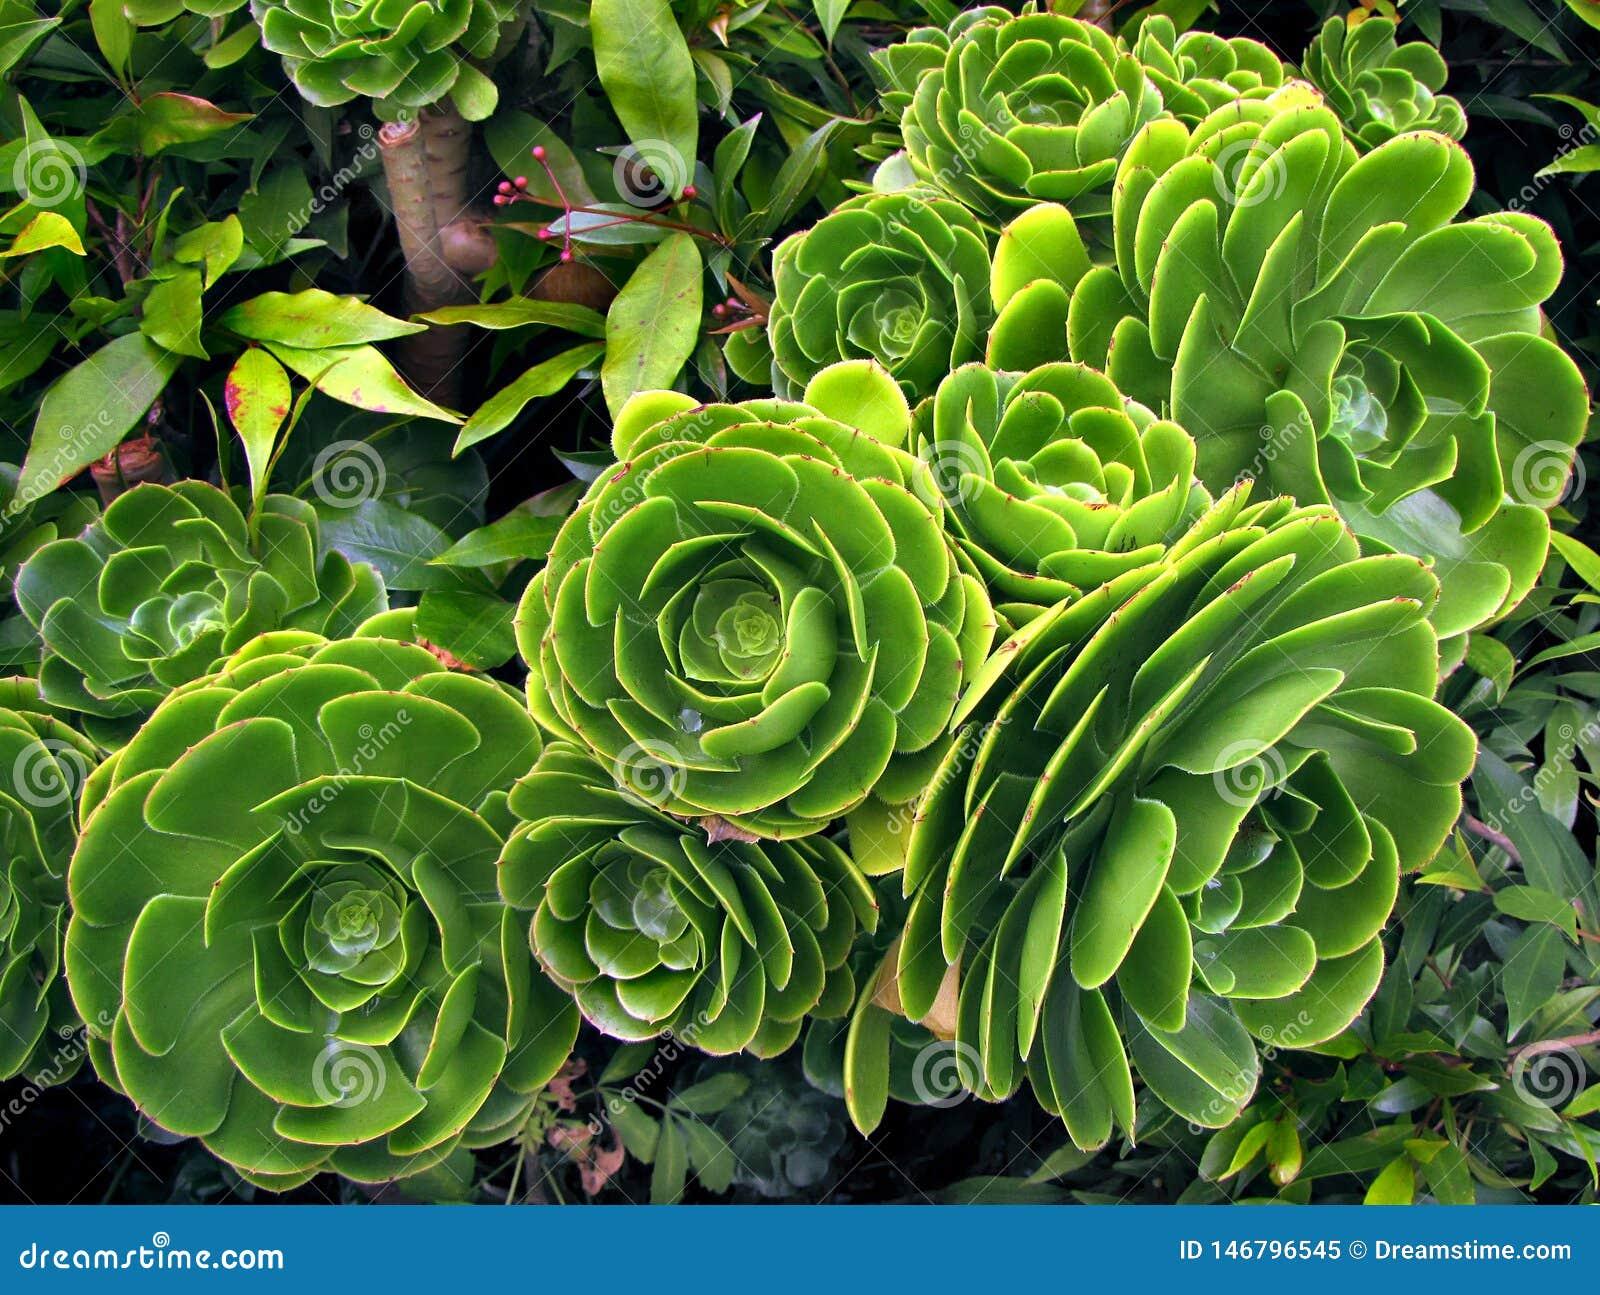 Grön suckulent växtaeoniumarboreum